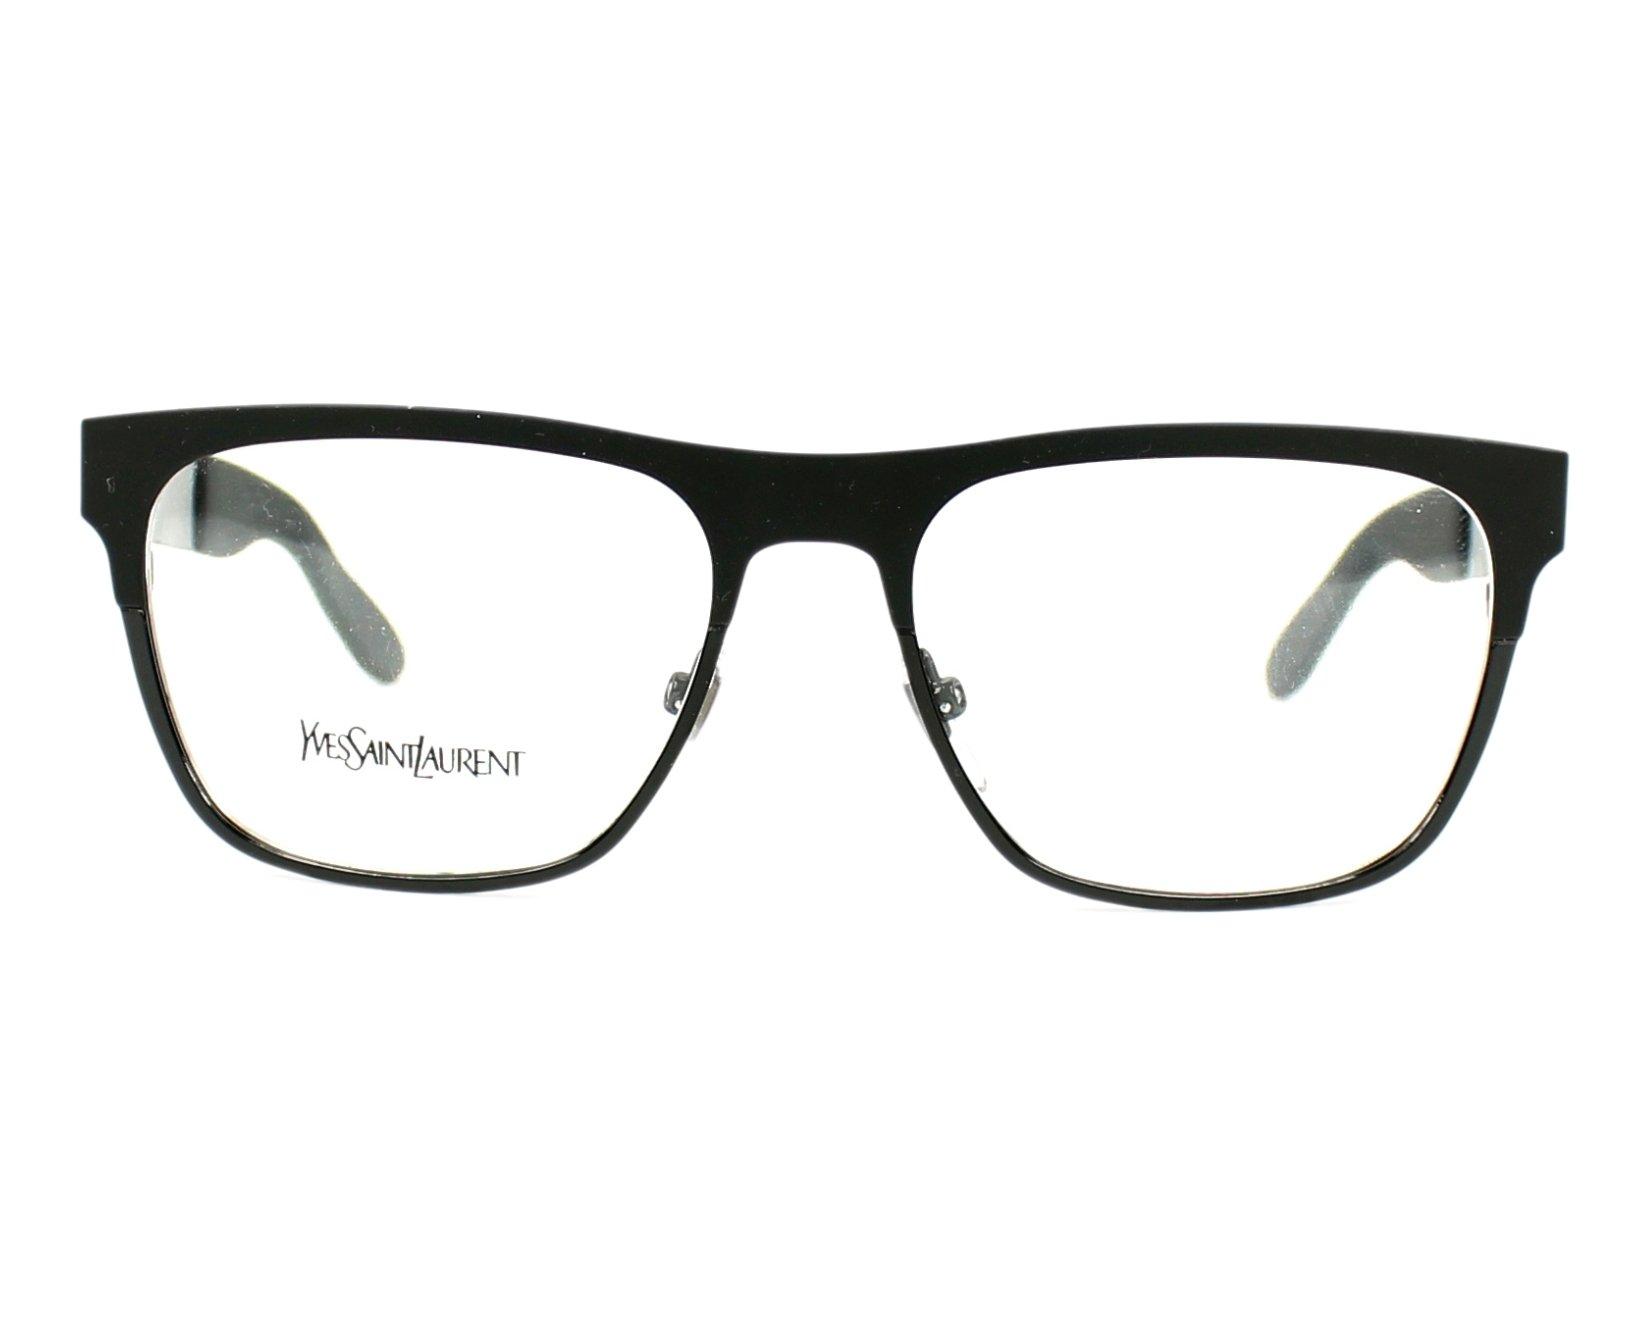 Yves saint laurent eyeglasses ysl 2329 yyb black visionet for Miroir yves saint laurent